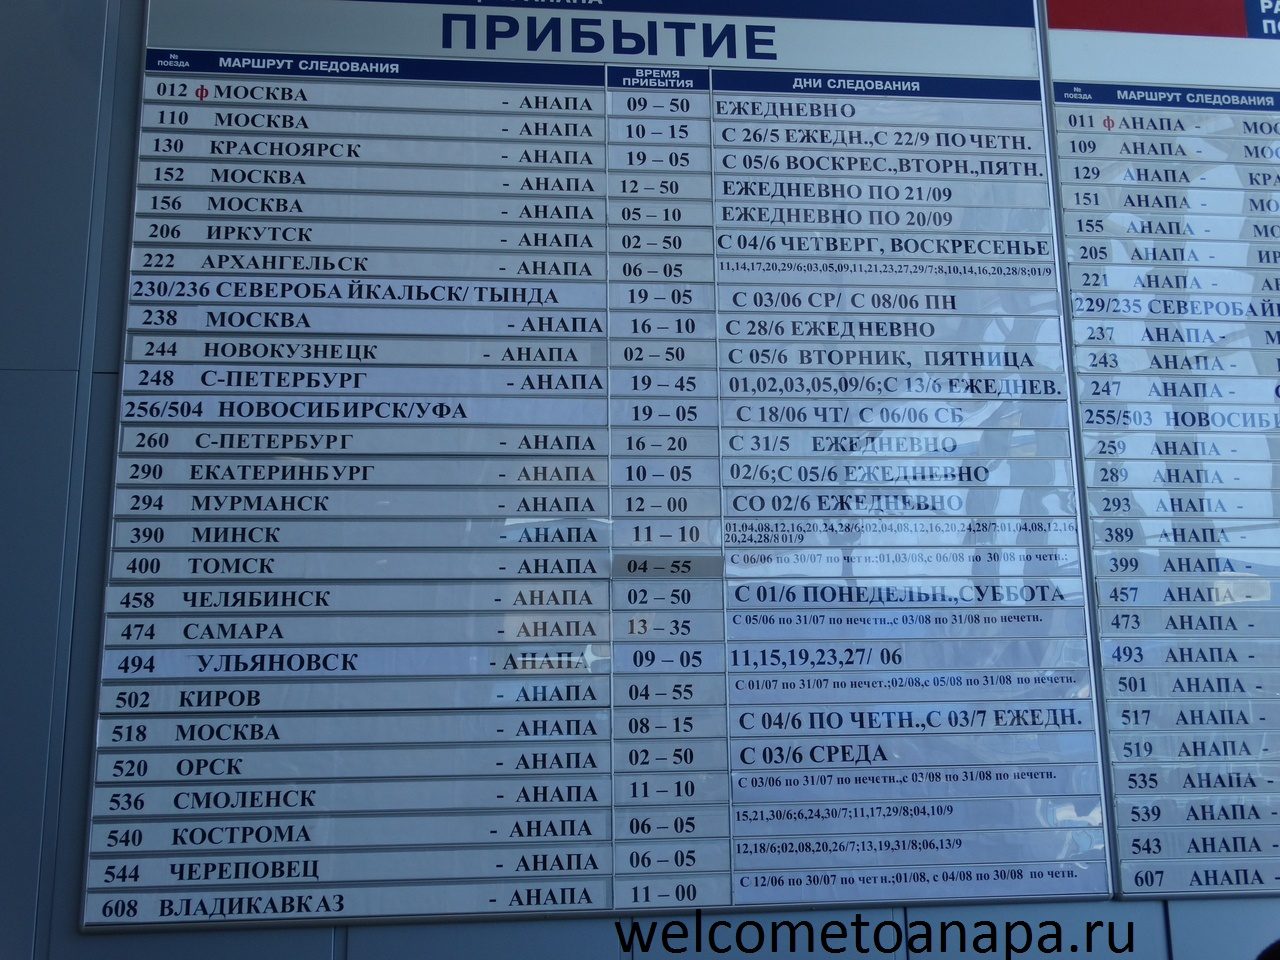 поезд анапа новокузнецк расписание цена билета рады